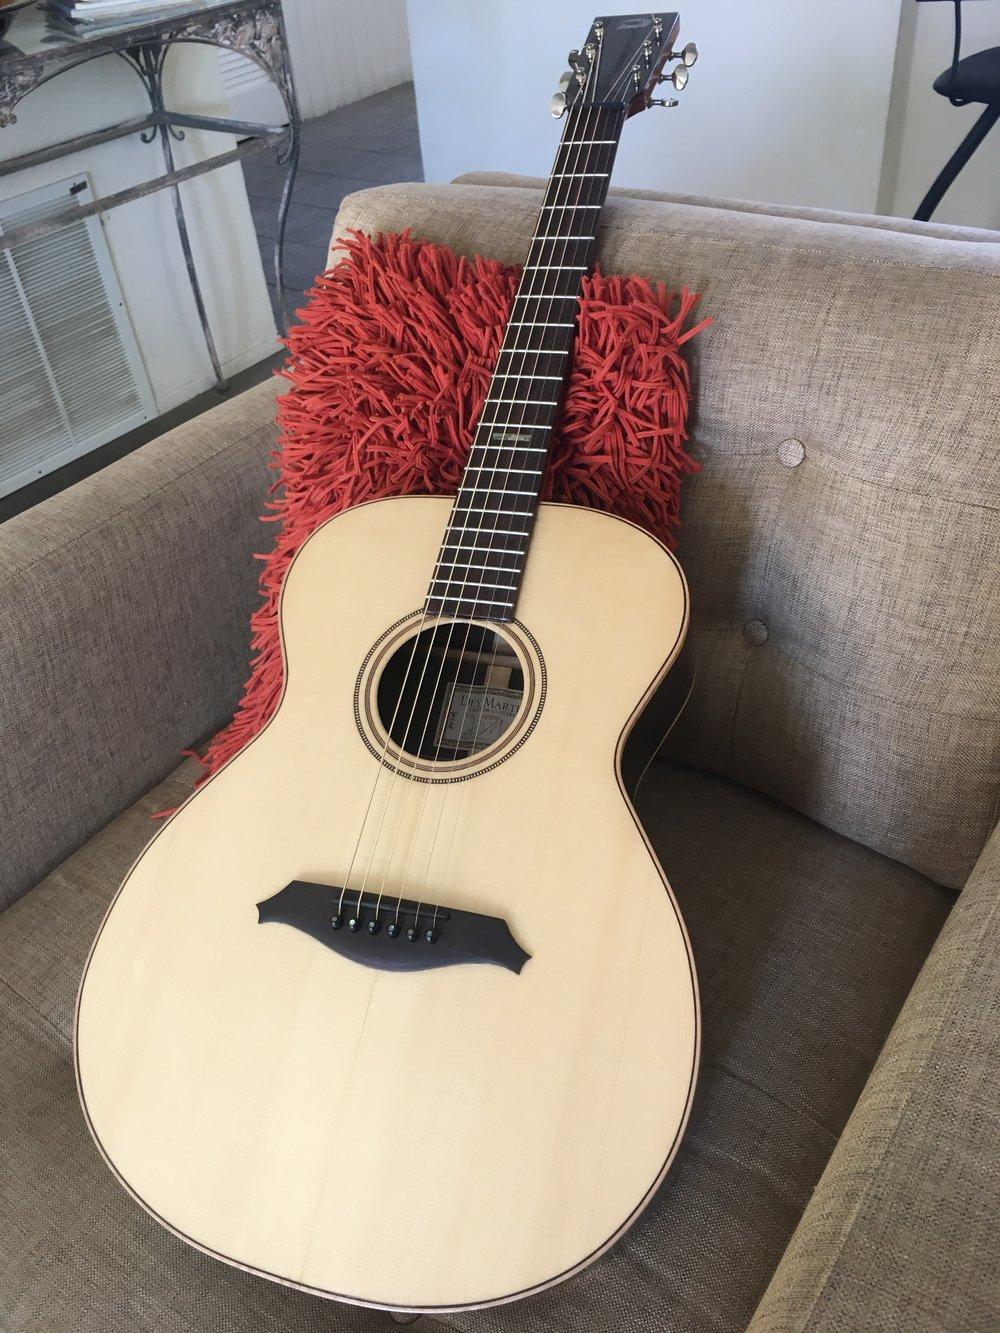 OO Dey Martin guitar